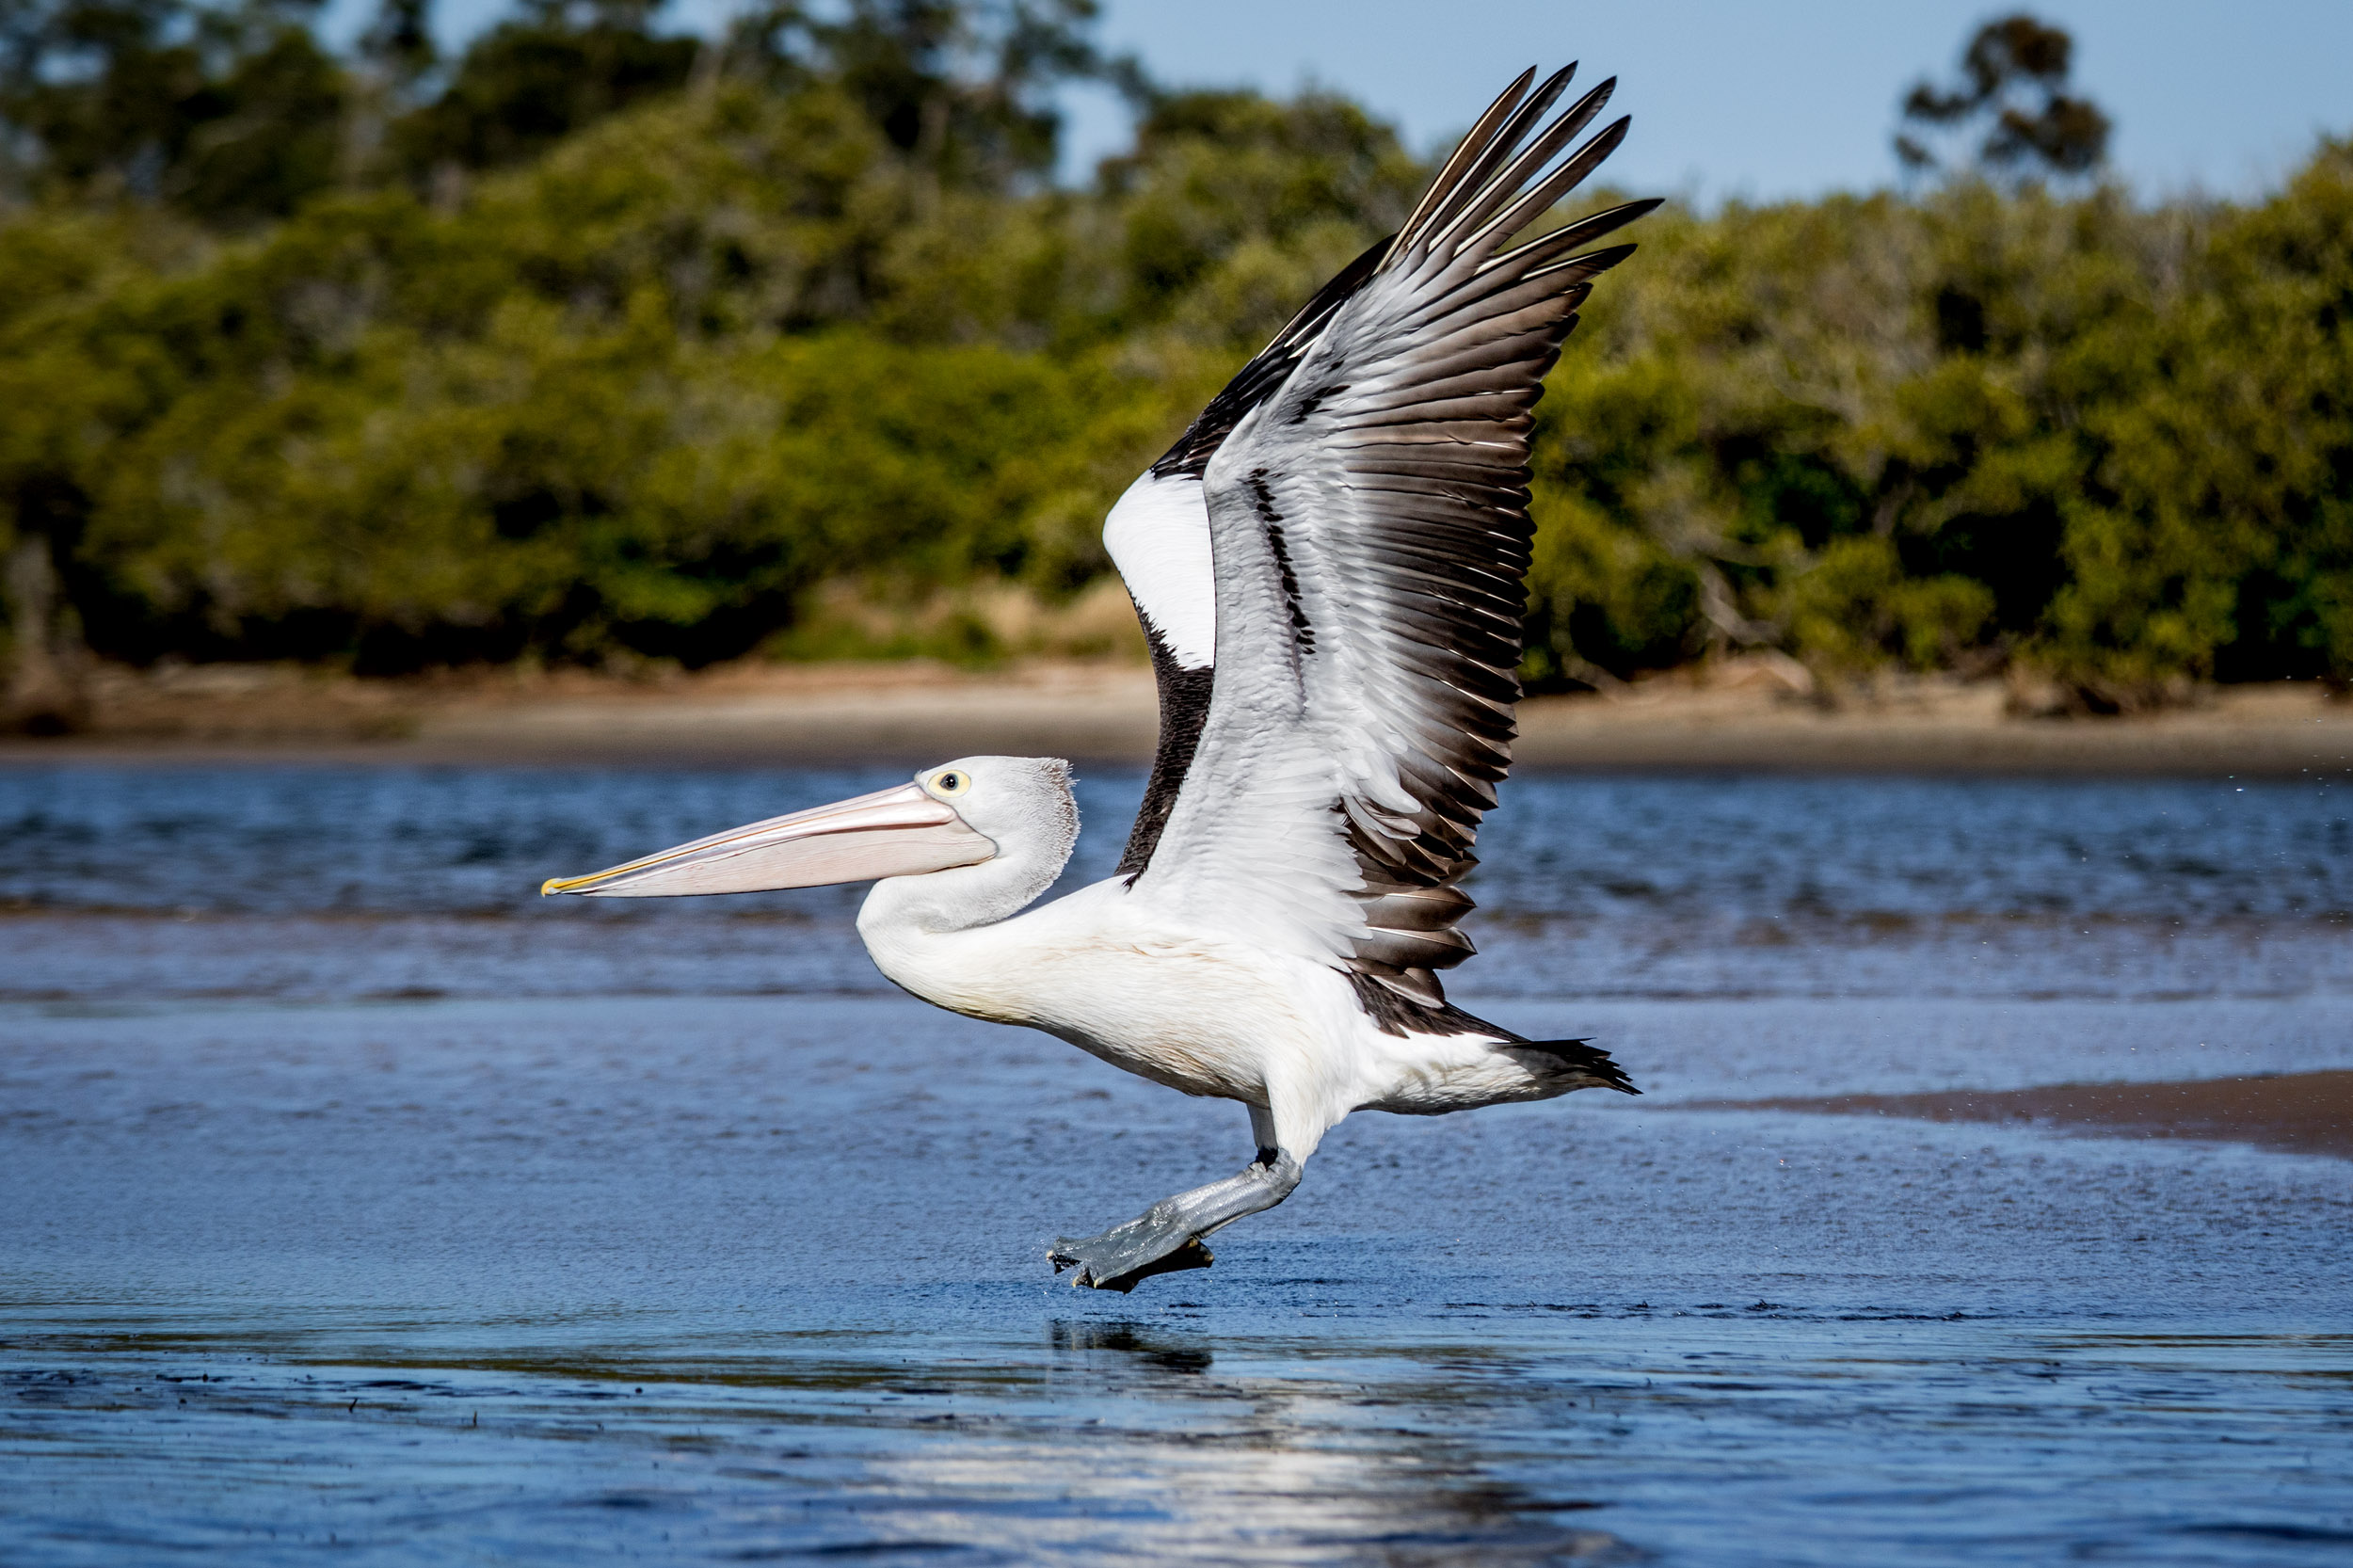 pelican-in-flight-mid-north-coast.jpg